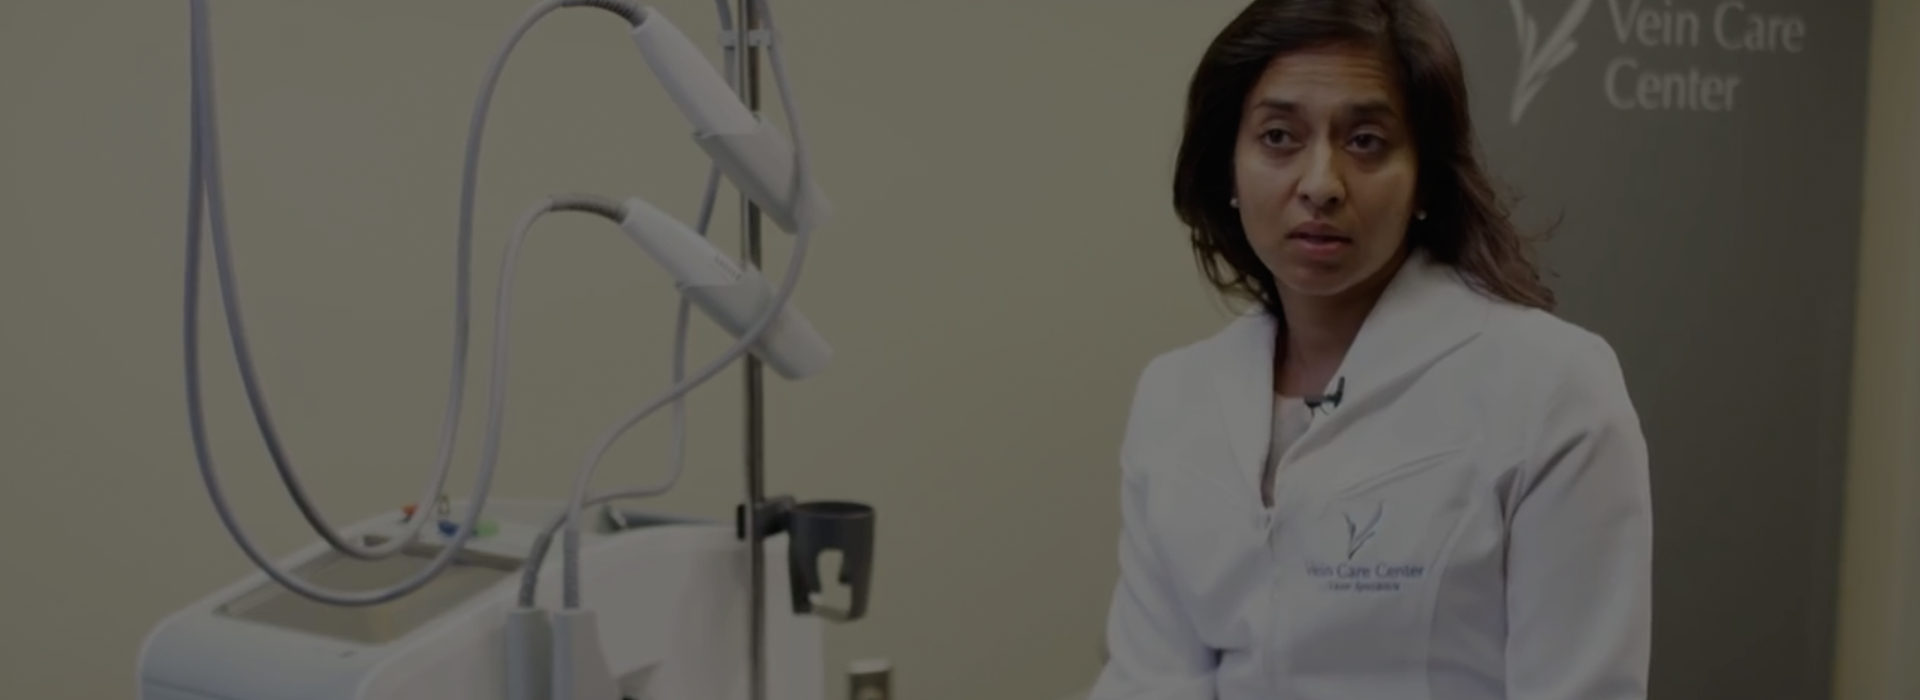 Vein Treatment - Dr. Aggarwal